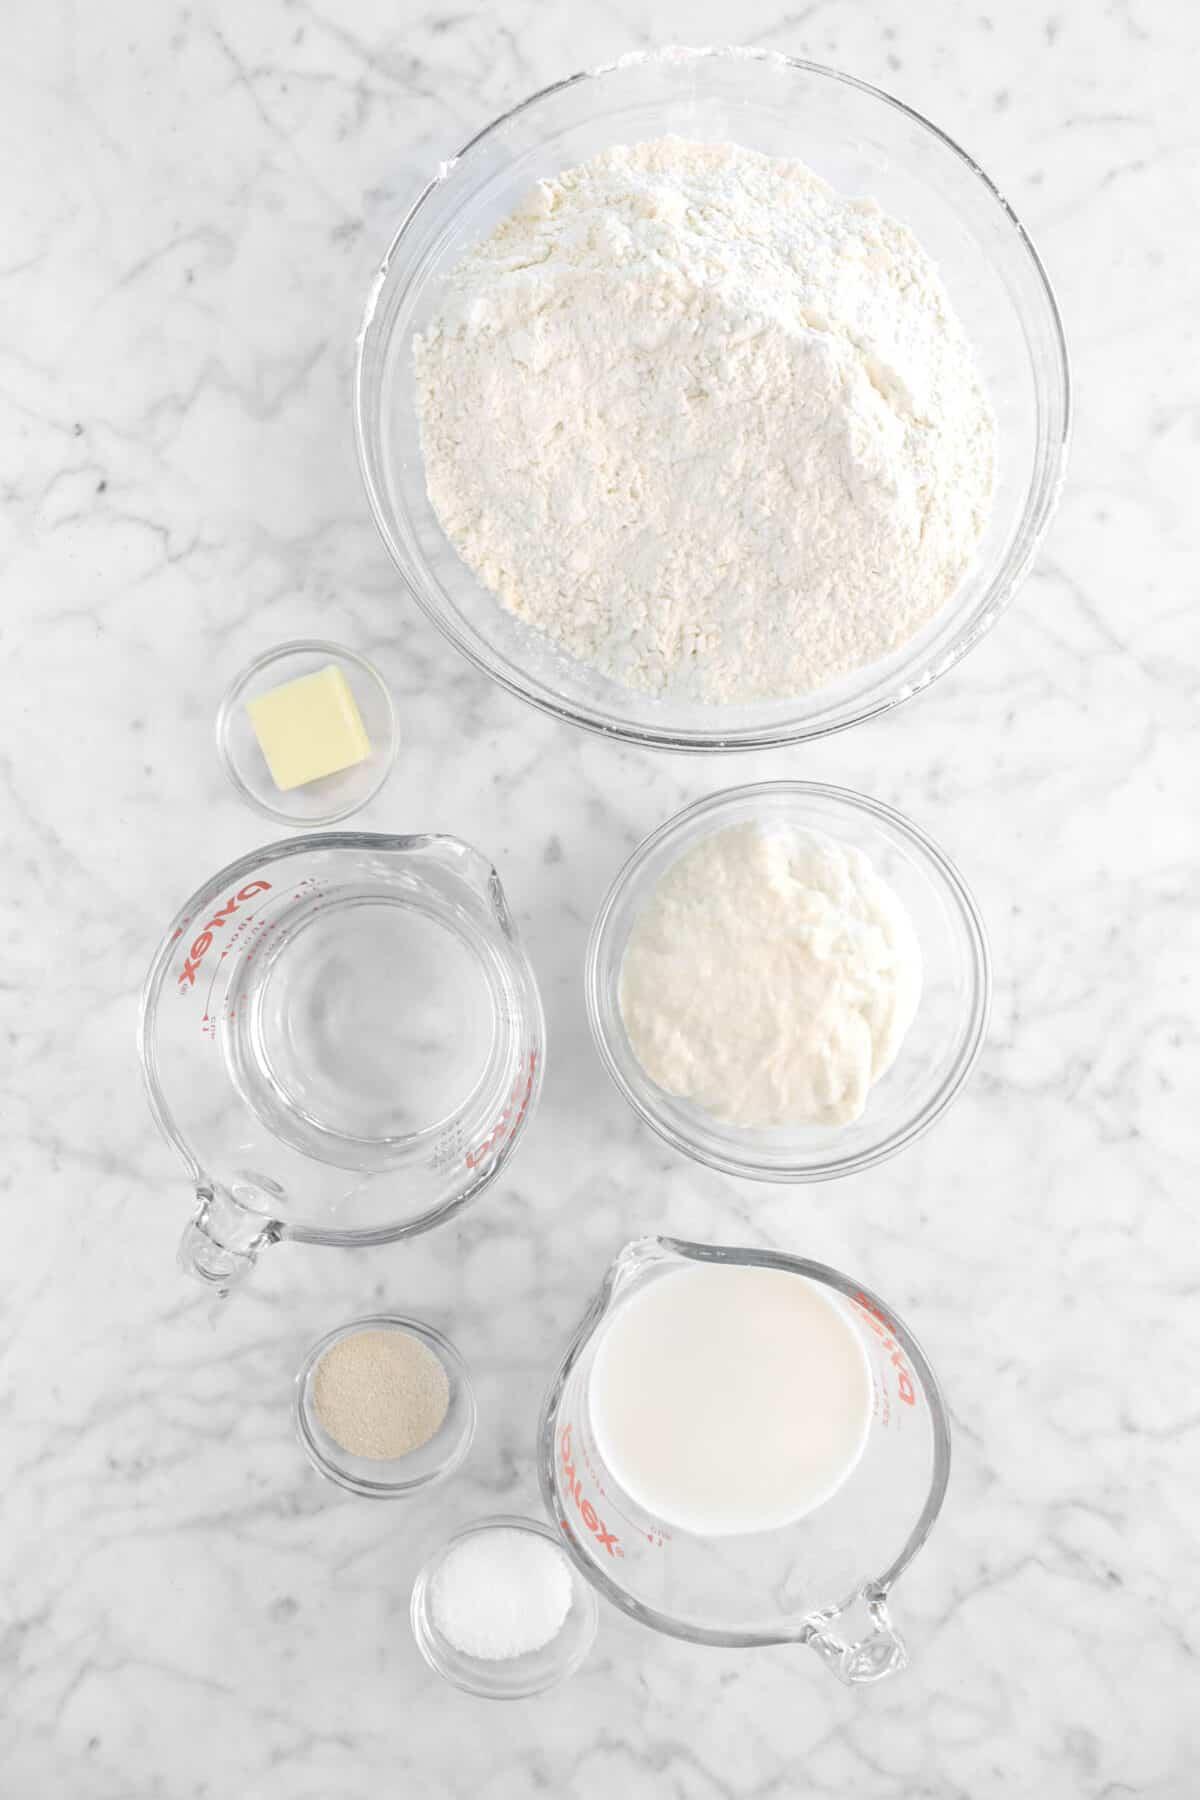 flour, butter, sourdough starter, water, milk, yeast, and salt on marble counter